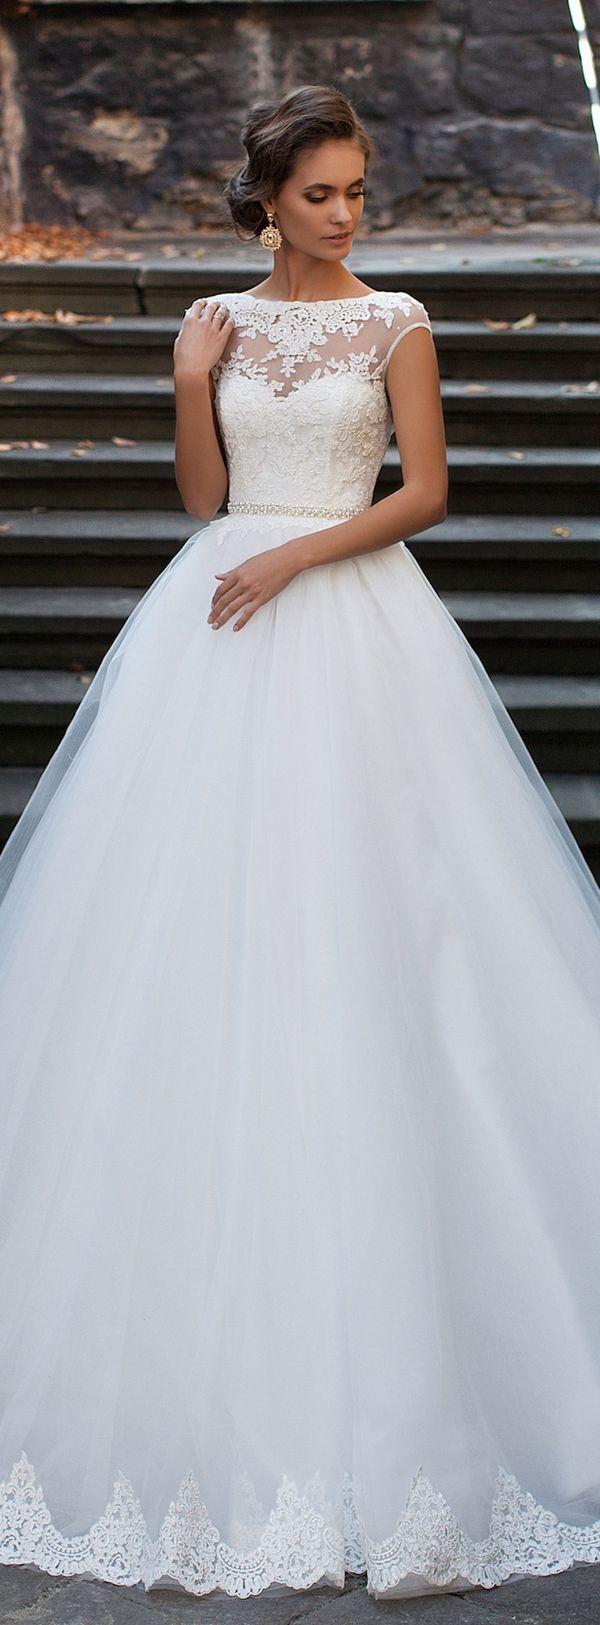 Guest at a wedding dress   Bride Dress for Wedding  Womenus Dresses for Wedding Guest